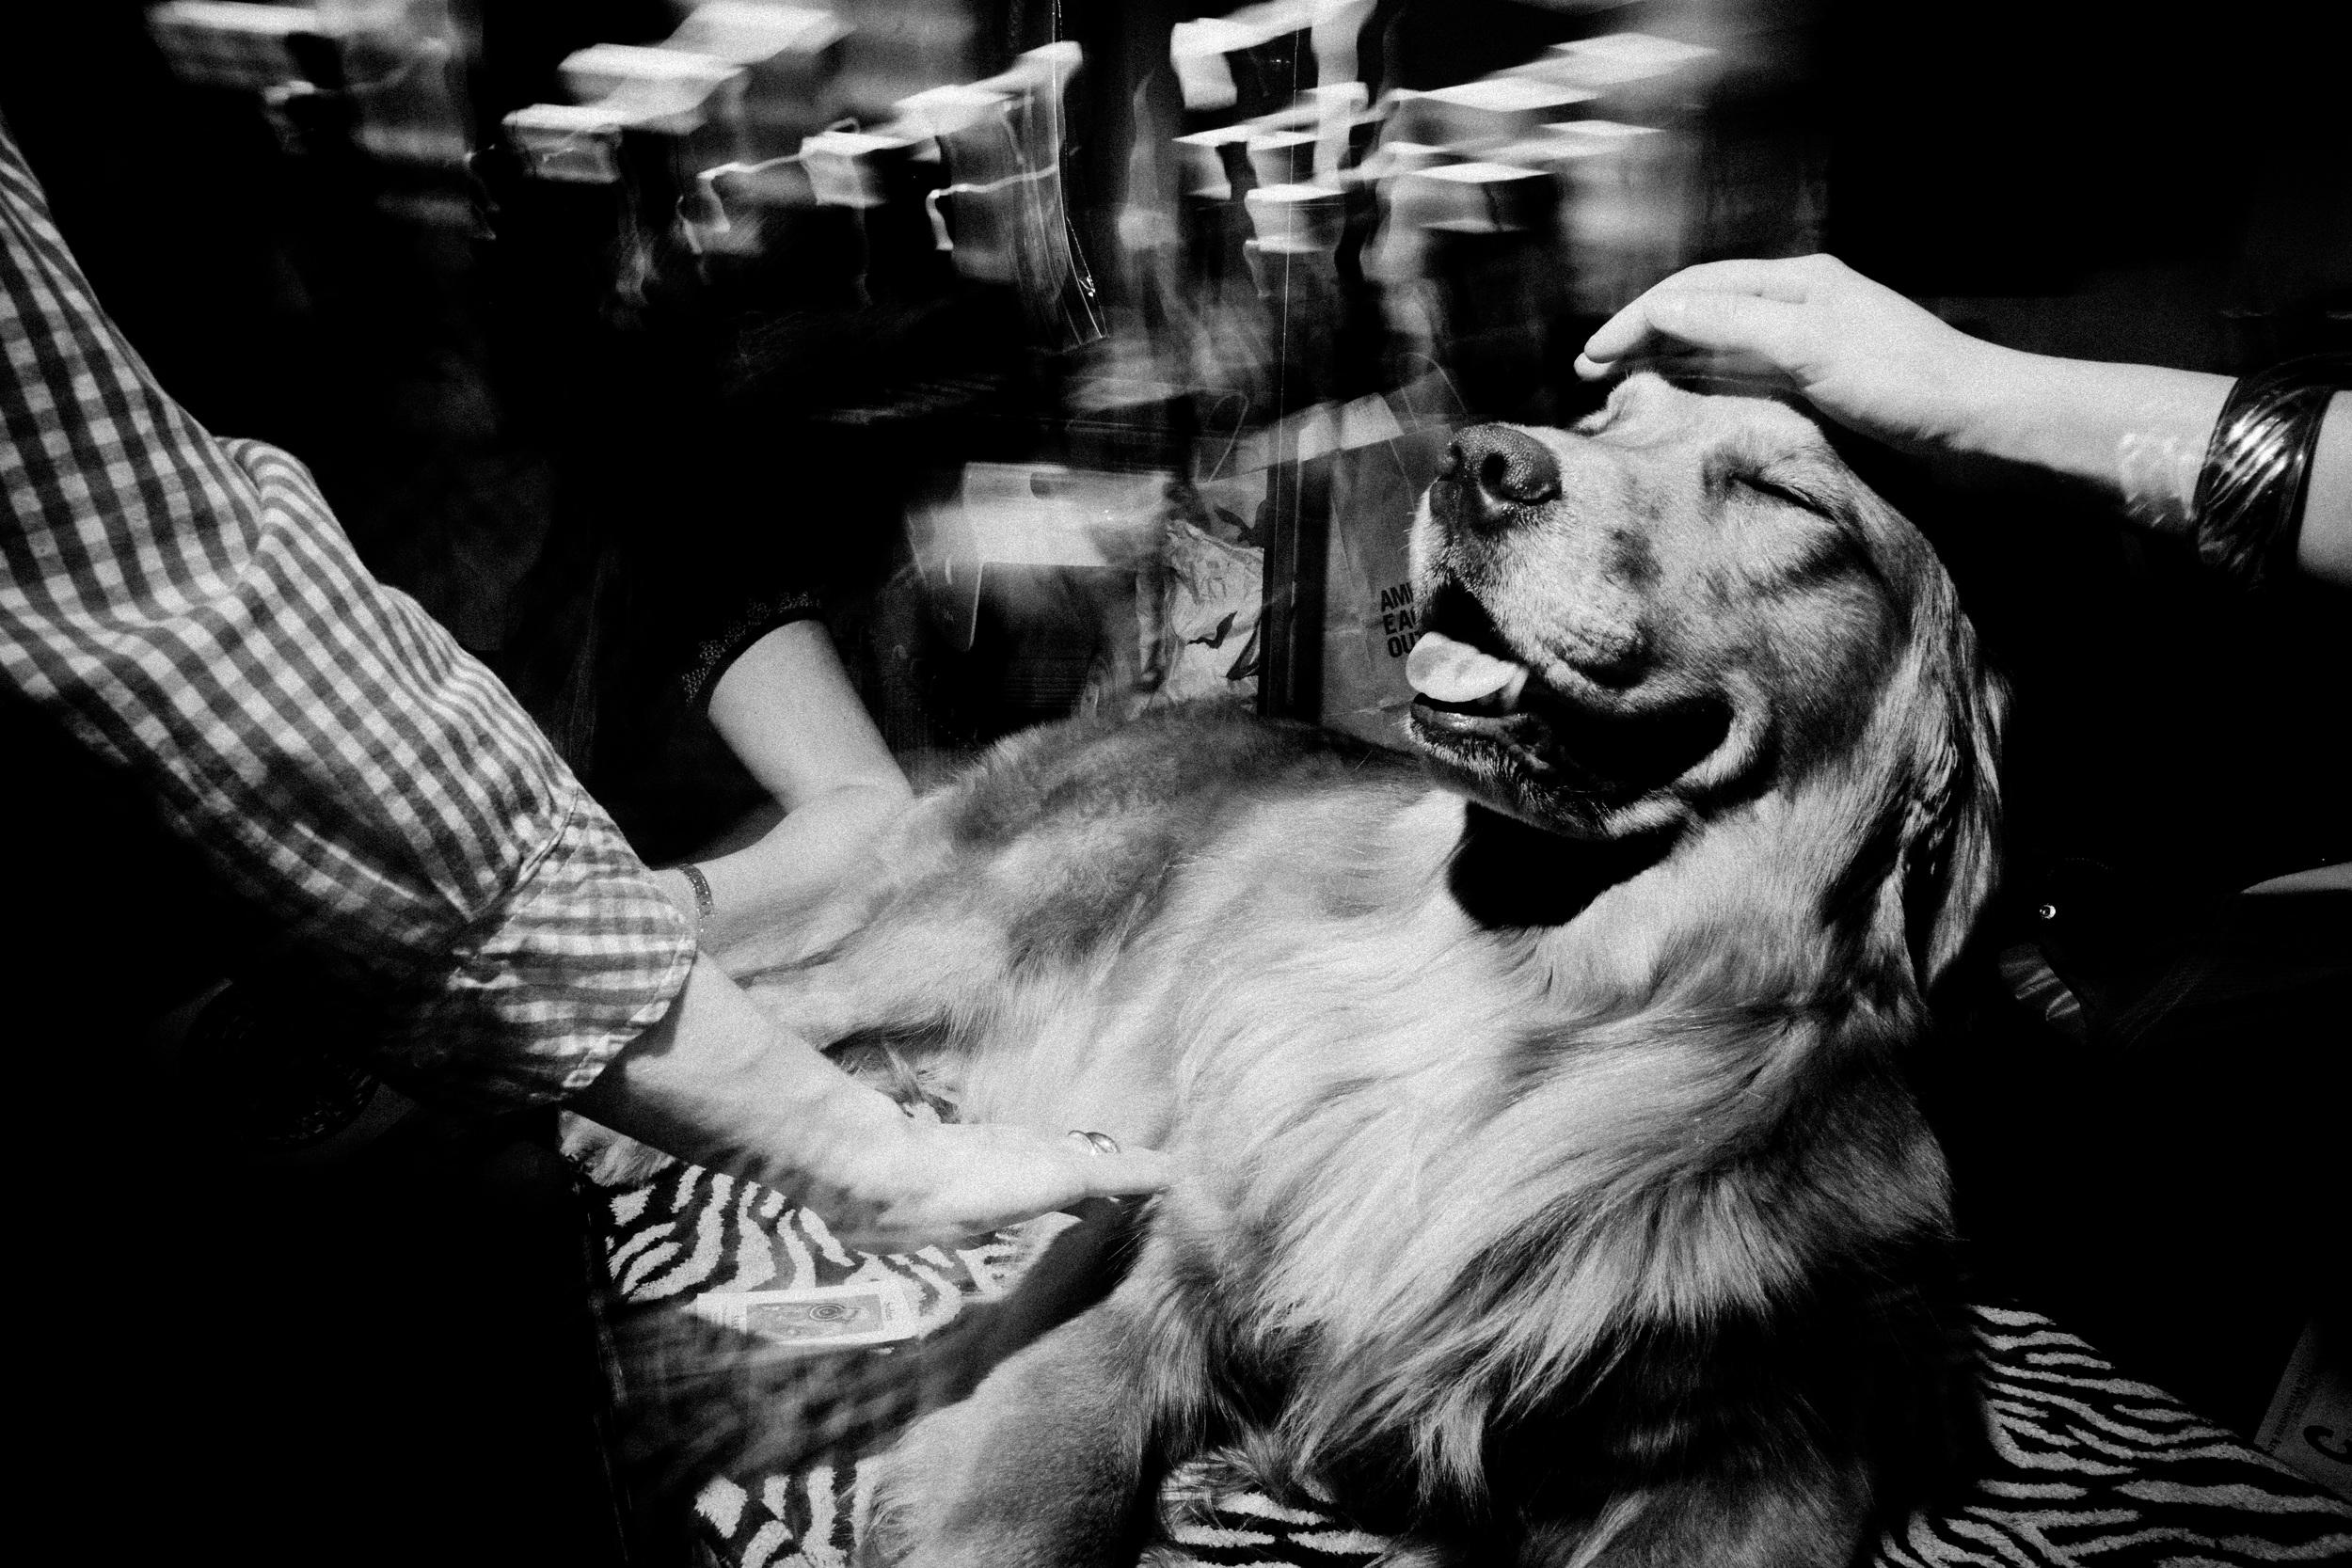 westmins_dog2012-0235.jpg